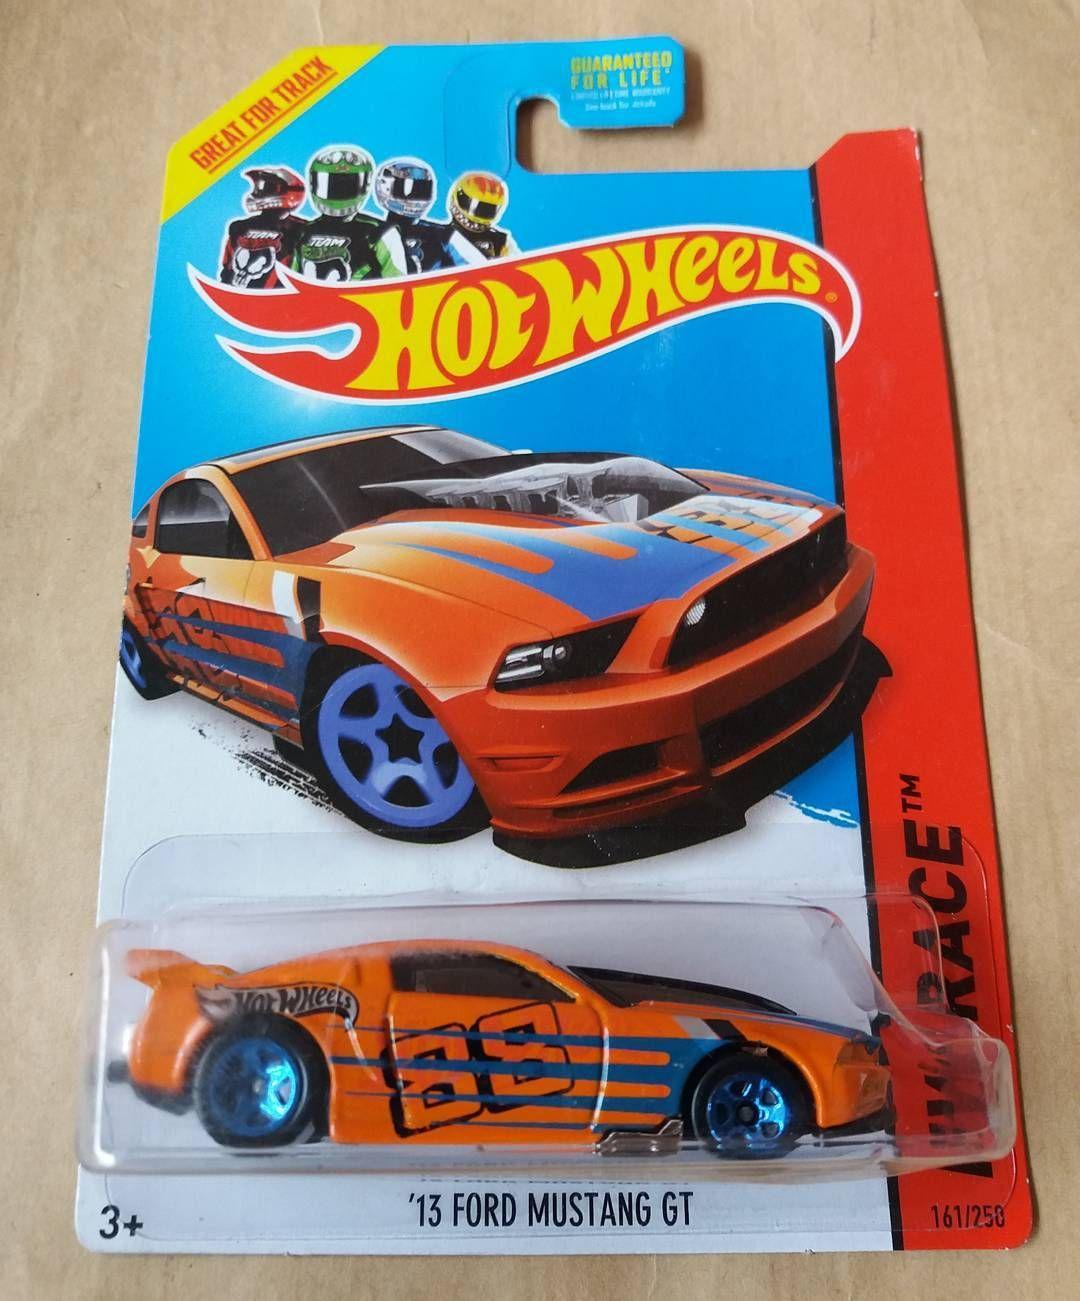 Ford Mustang GT Stok : 1Pcs Harga : 20rb KONDISI SESUAI FOTO  WA : 0857 1475 9317 LINE : suryajaya15 PIN : 5C75651D  #hotwheels #mattel #diecast #khwl #hotwheelscollector #jualbelihotwheels #thelamleygroup #hotwheelsmania #hotwheelsjakarta #hotwheelsmurah #hotwheelspics #koleksihotwheels # #hotwheelsaddict #diecastcollector #toysforsale #jualmainan #jualhotwheels #jualhotwheelsmurah #jualanhotwheels #diecastforsale #hotwheelslovers #hotwheelskaskus by sjy_garage